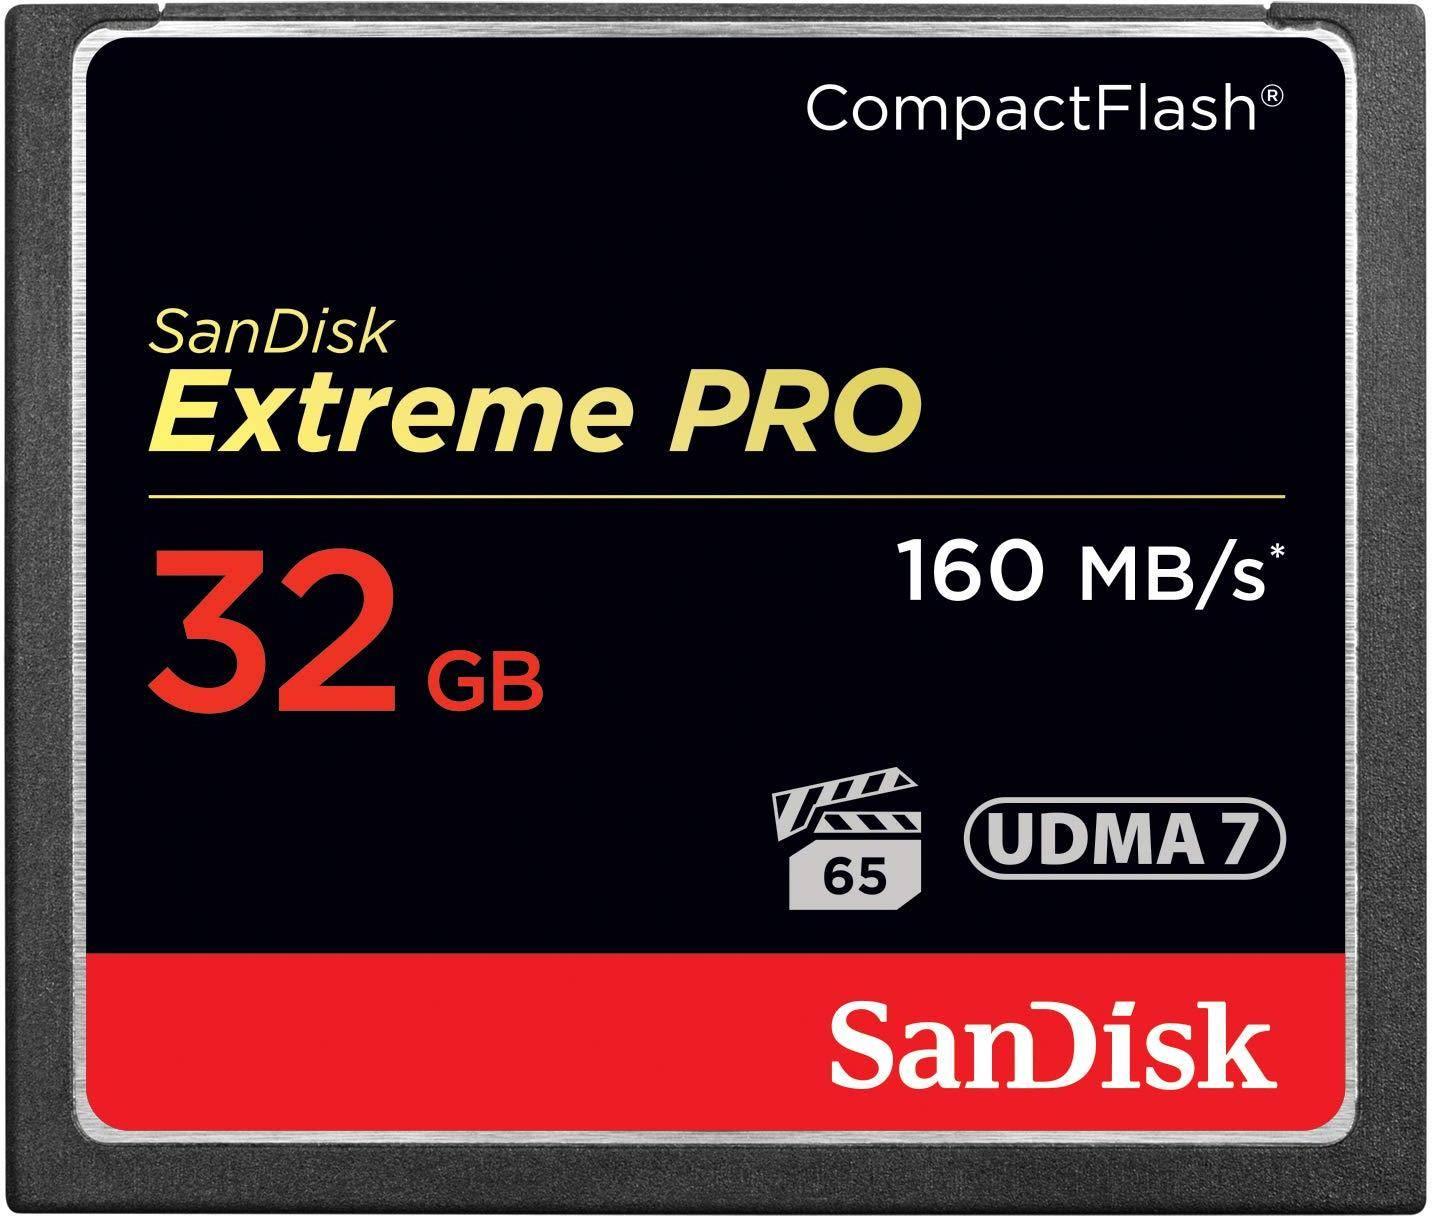 SanDisk Extreme Pro 32GB CompactFlash Memory Card  zoom image